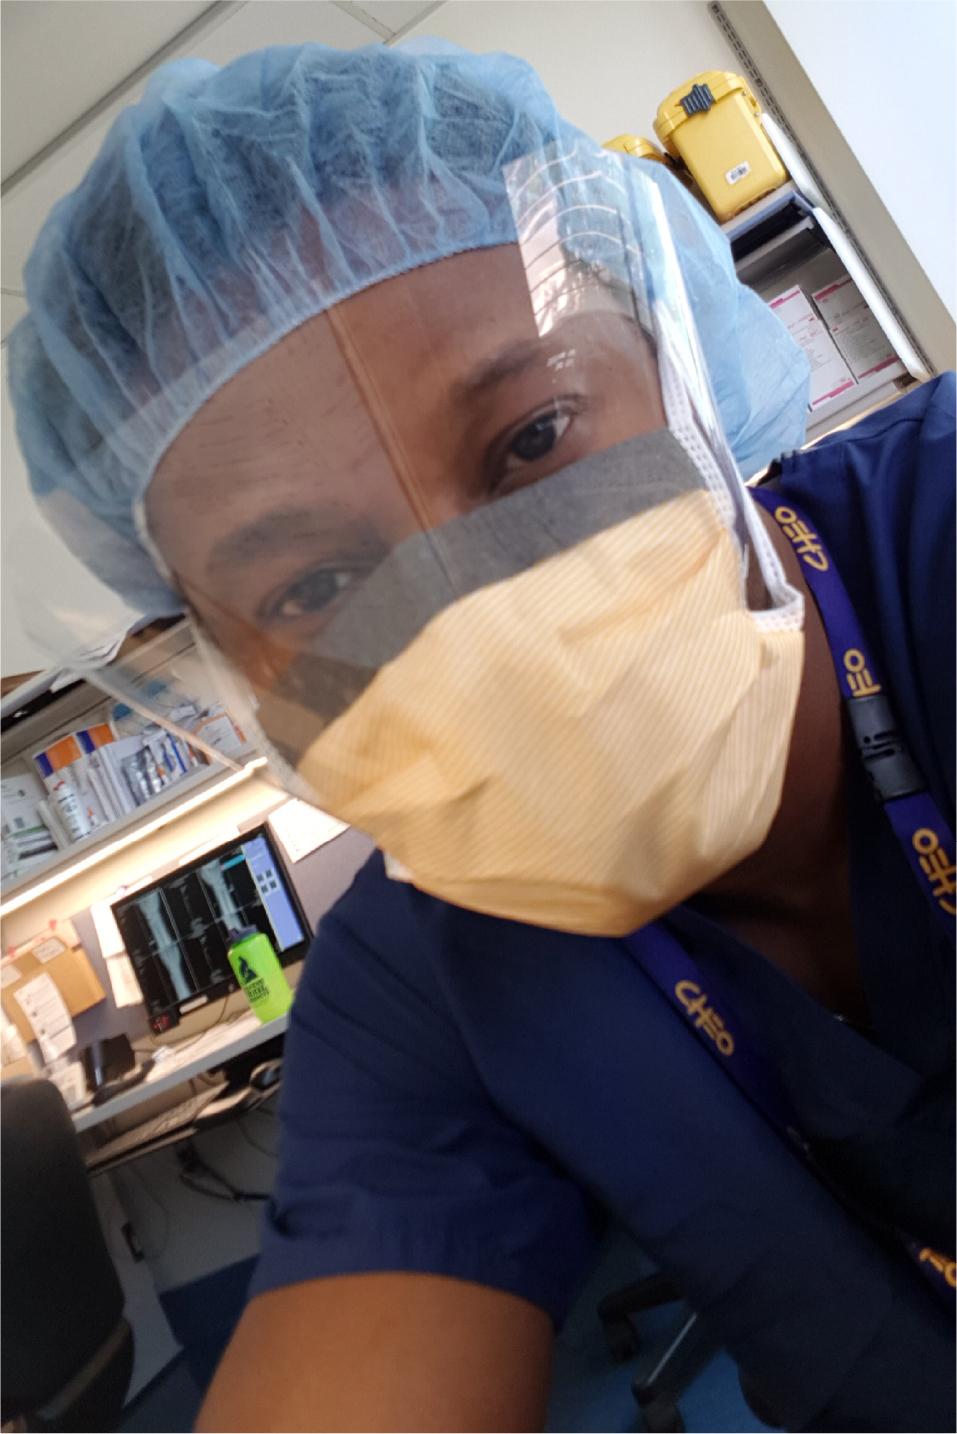 Dr. Karry Felix in surgeon's garb